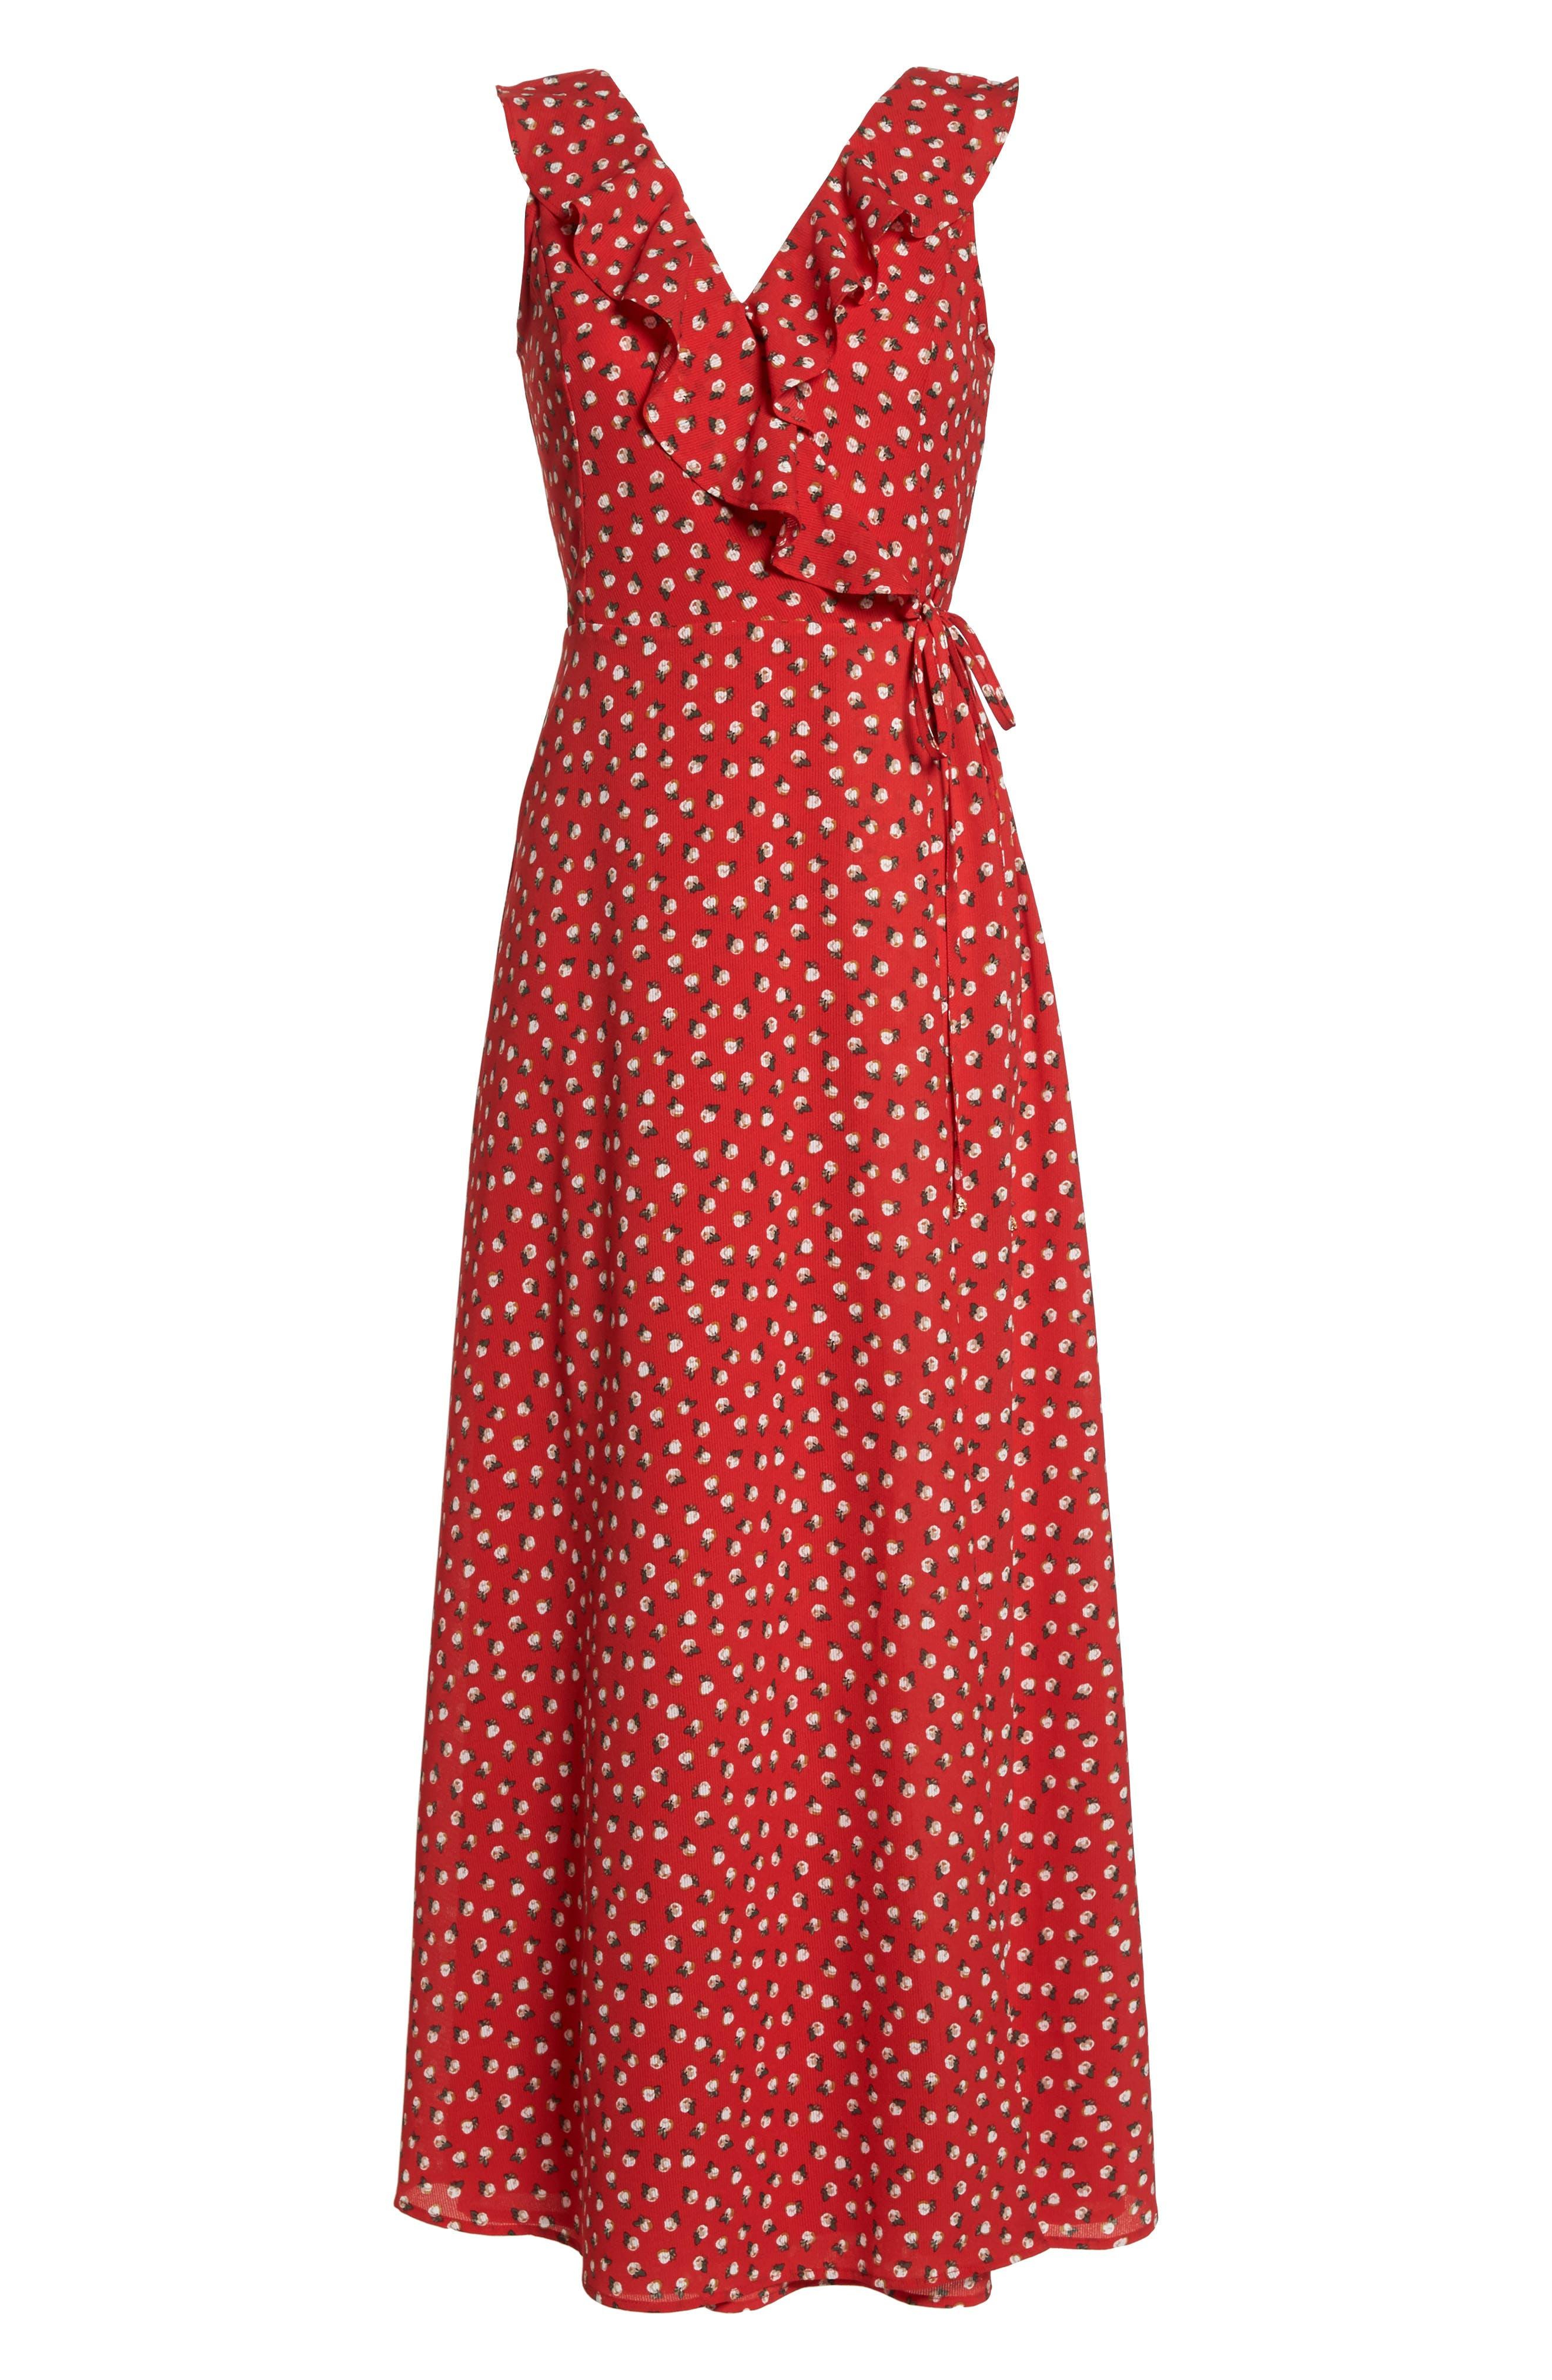 Nora Maxi Dress,                             Alternate thumbnail 7, color,